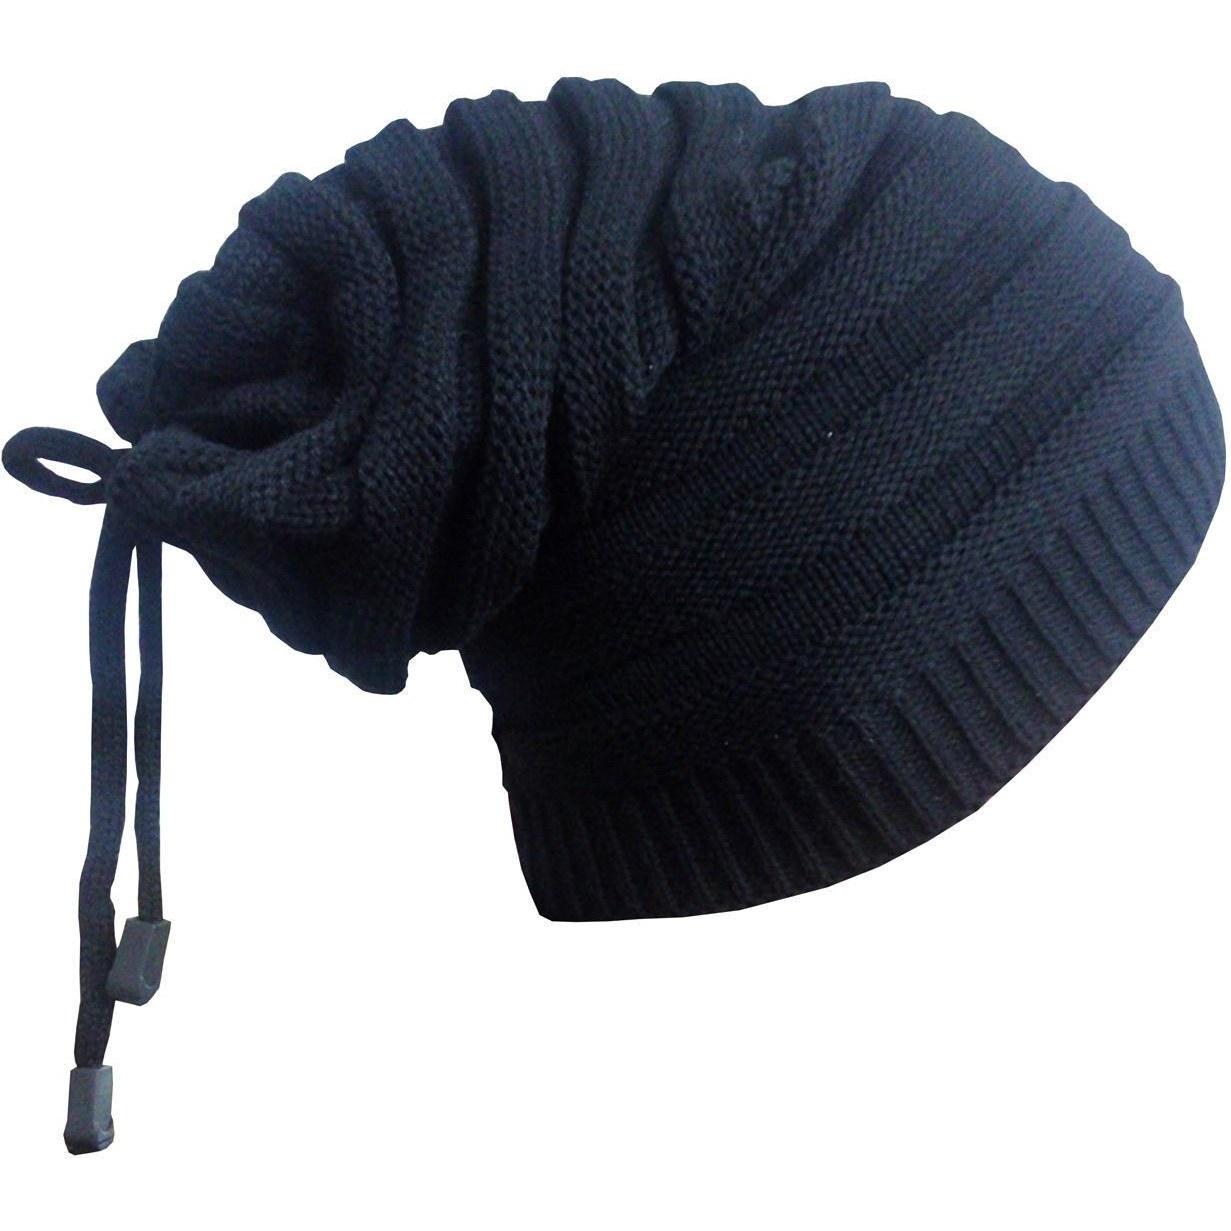 کلاه بافتنی مردانه شالی مدل arvin208